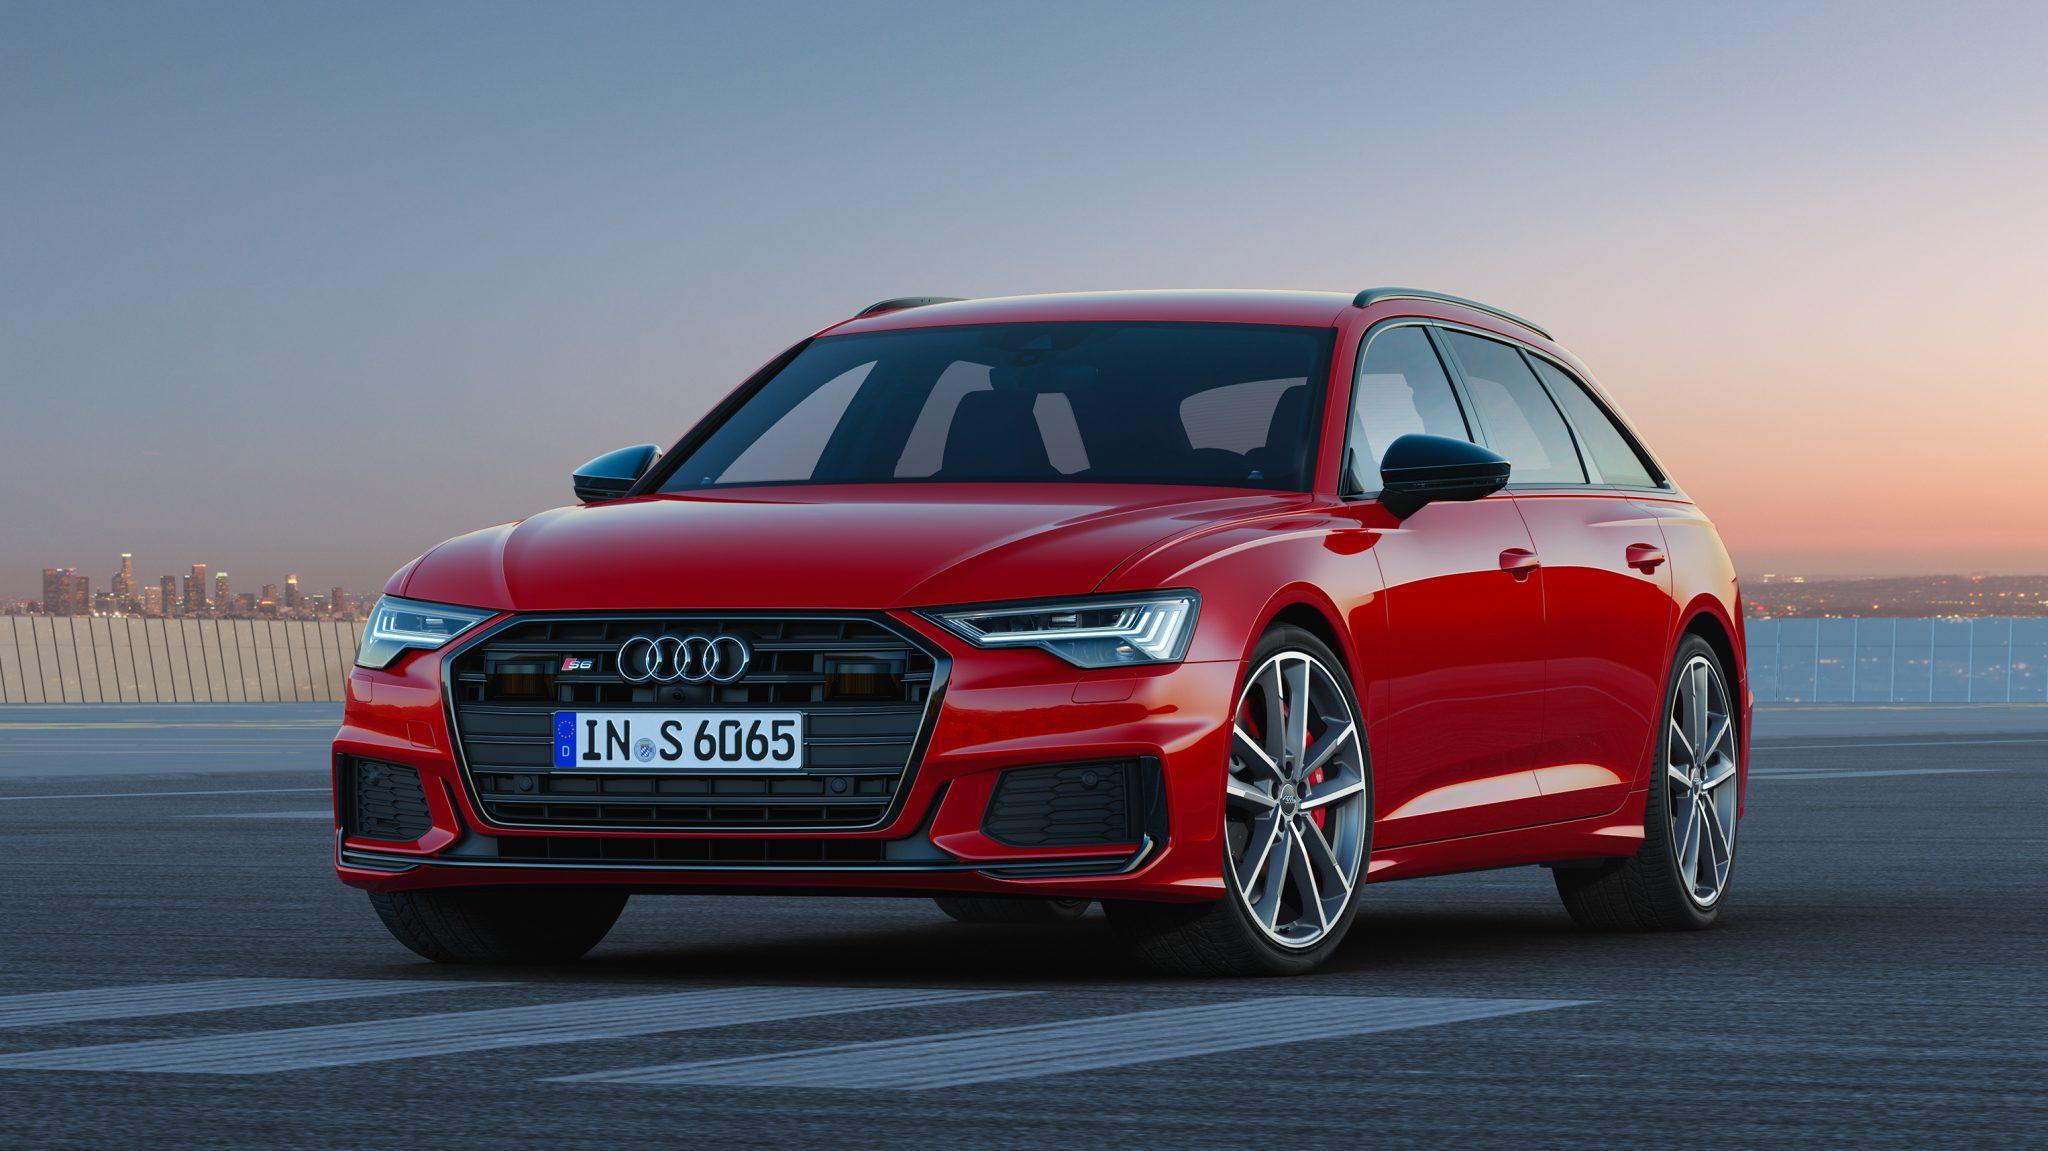 Audi S6 TDI Avant Tango Rood